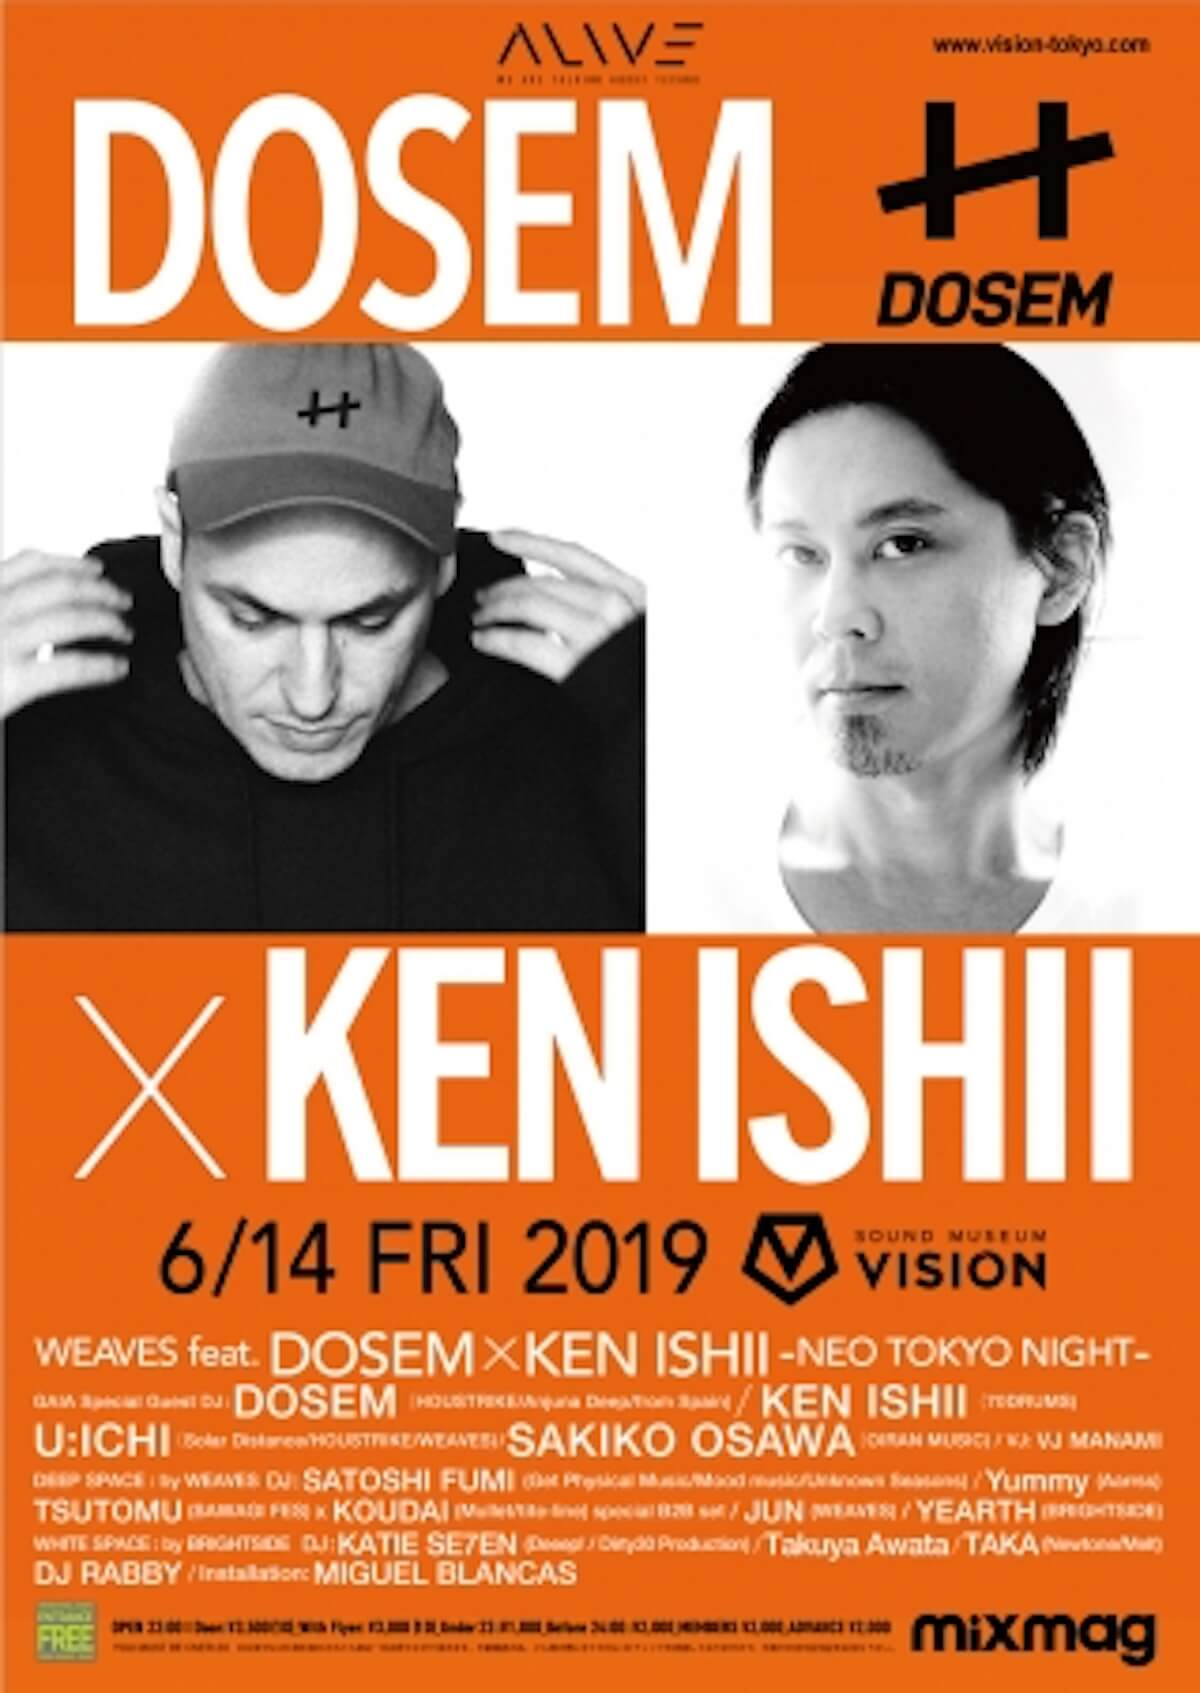 DOSEM × KEN ISHIIのスペシャルコラボパーティーが渋谷VISIONにて開催|U:ICHI、SAKIKO OSAWAらも登場 music190614vision-dosem-kenishii_info